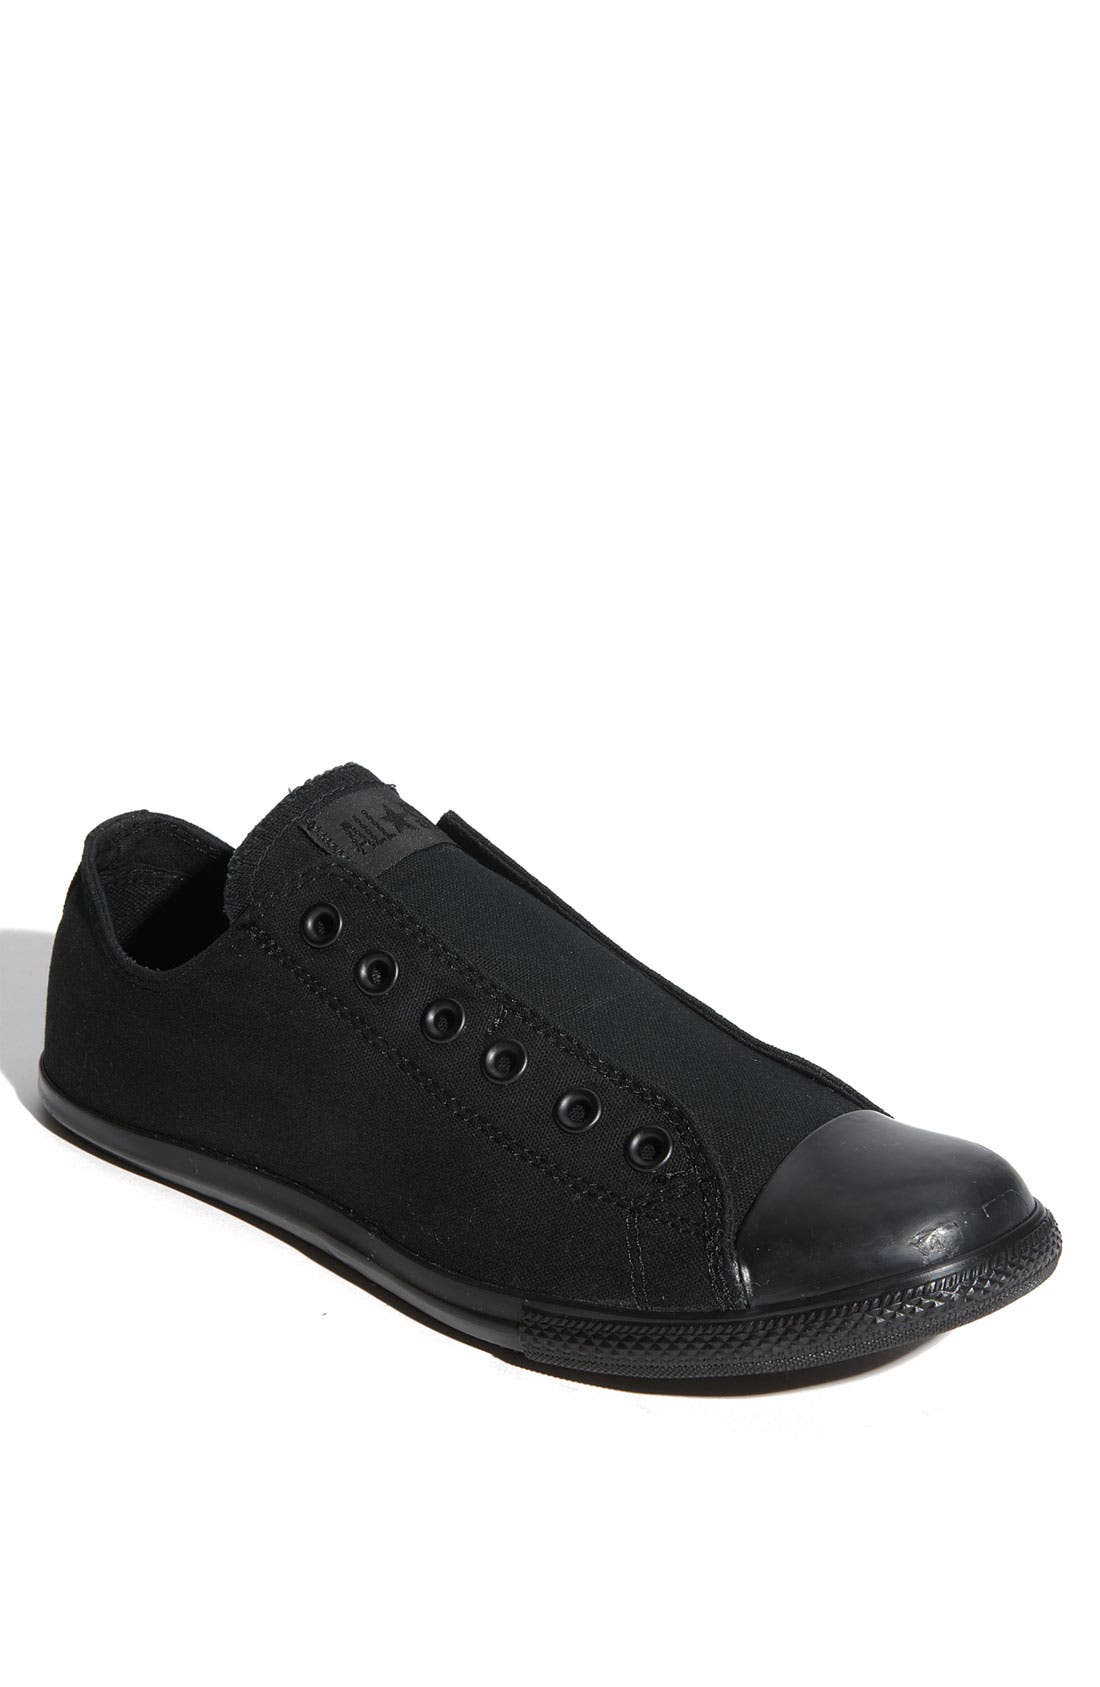 Main Image - Converse Chuck Taylor® 'Slim' Low Top Canvas Sneaker (Men)